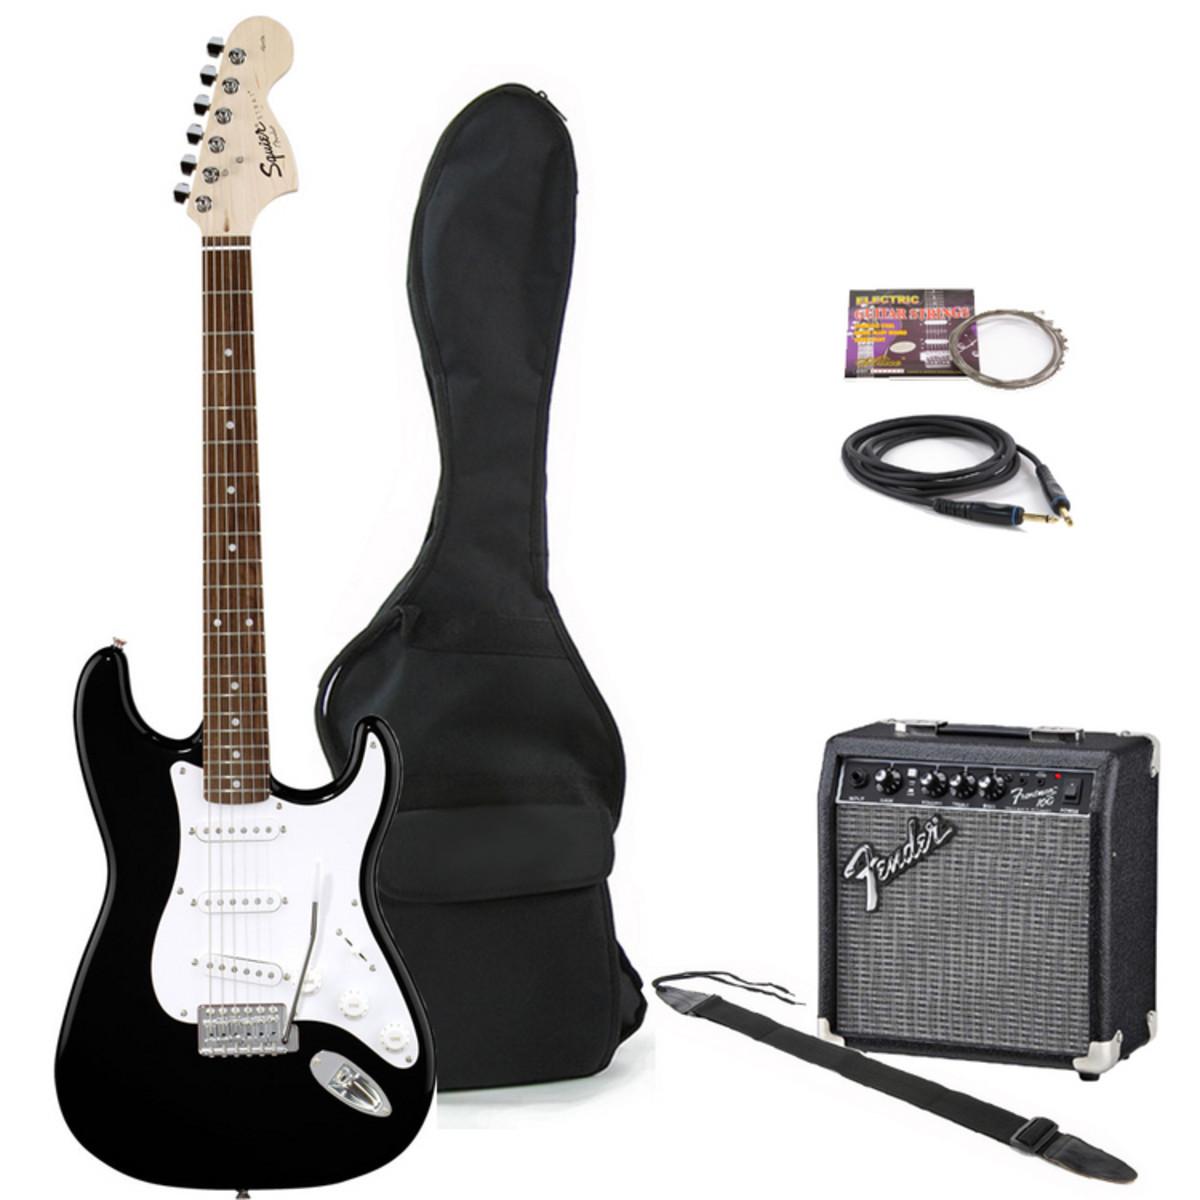 squier bullet strat frontman 10g amp pack black at gear4music. Black Bedroom Furniture Sets. Home Design Ideas